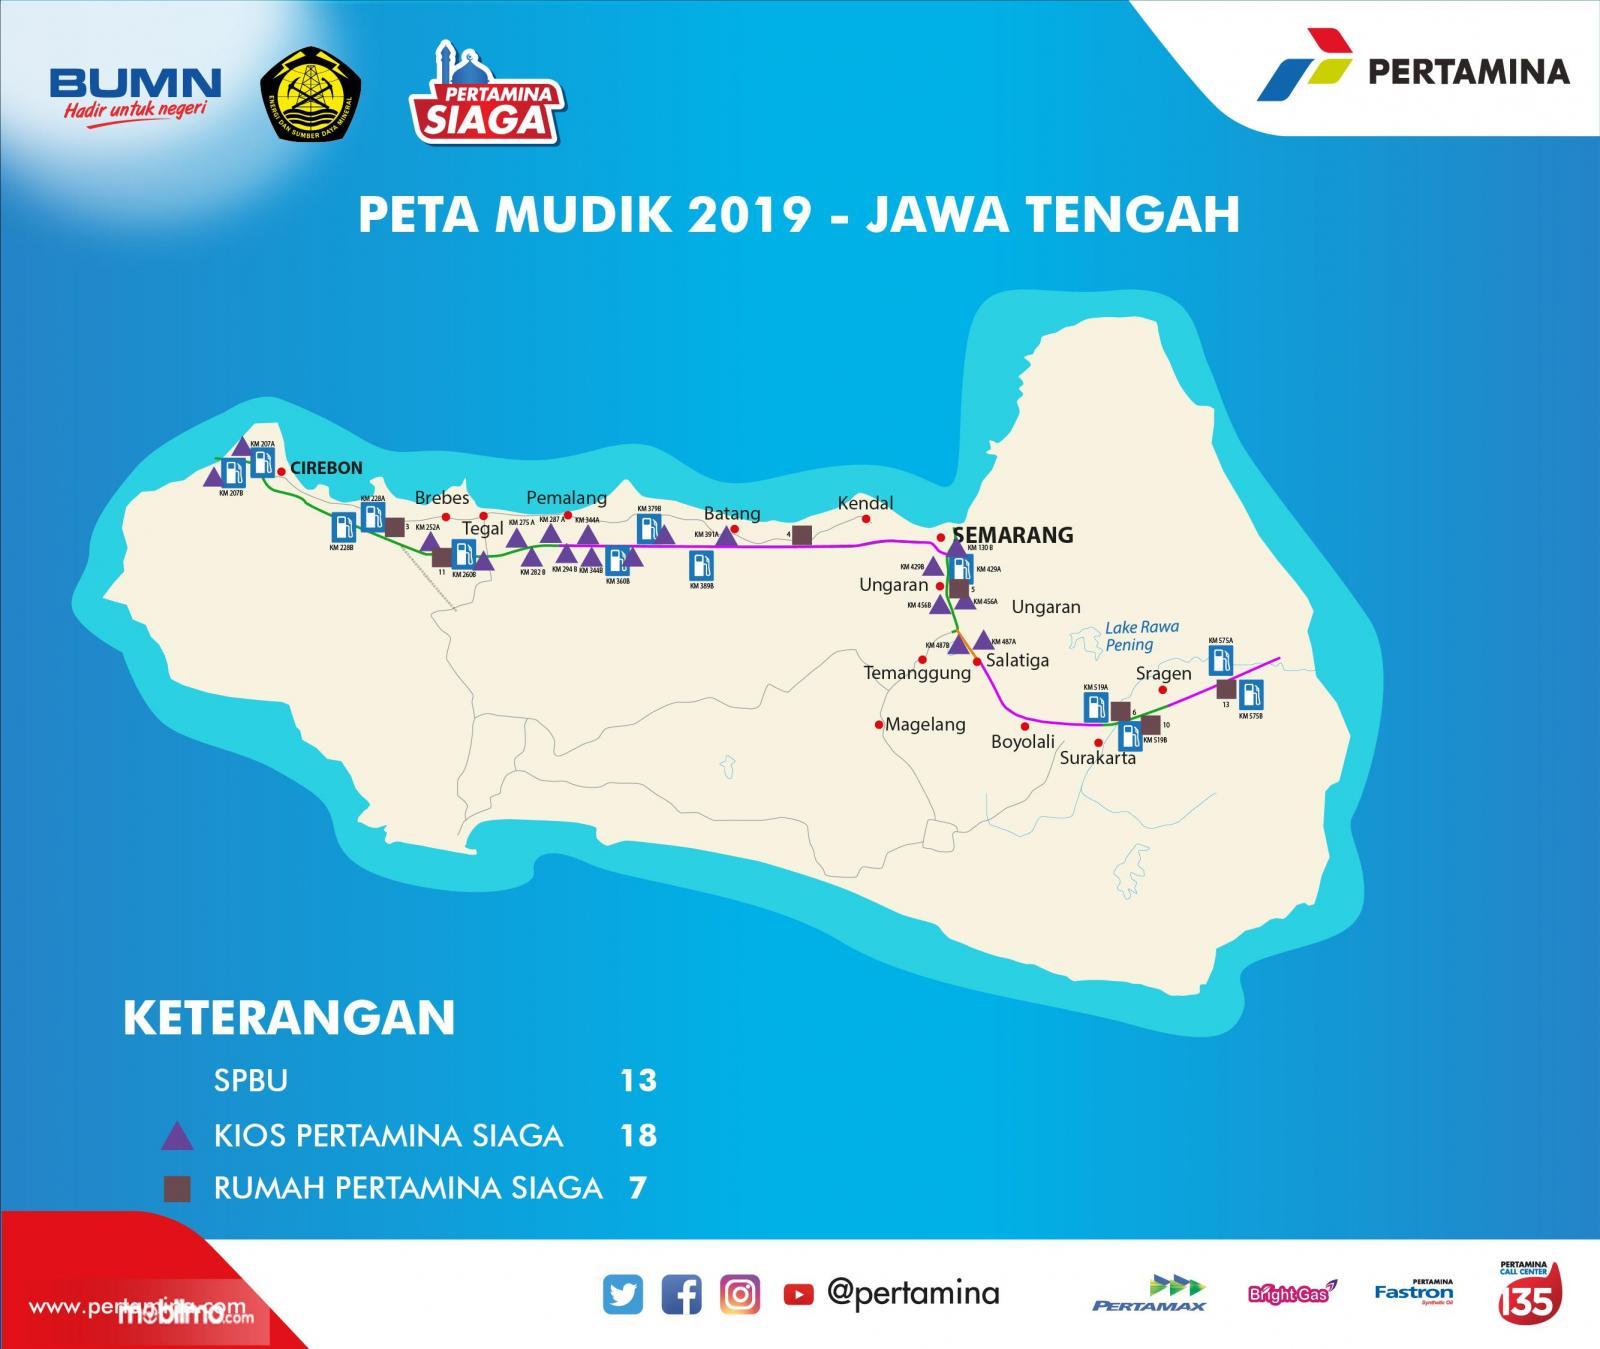 Peta Pertamina Siaga wilayah Provinsi Jawa Tengah